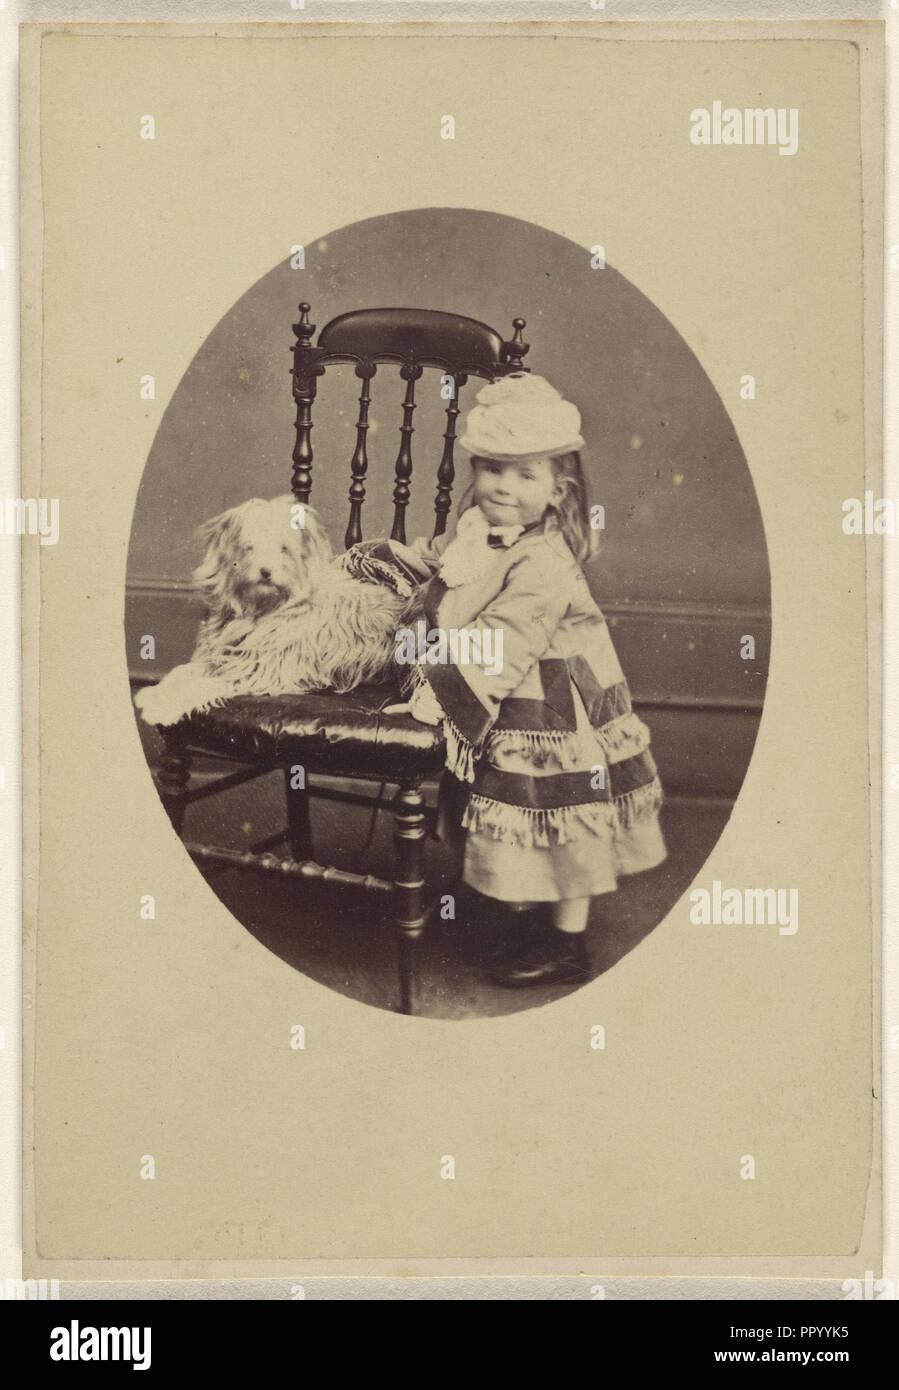 Mary S. Hamilton. May 1872. Aged 3 1,2; G. Parker, British, active Pittville, Cheltenham, England 1860s - 1870s, May 1872 - Stock Image